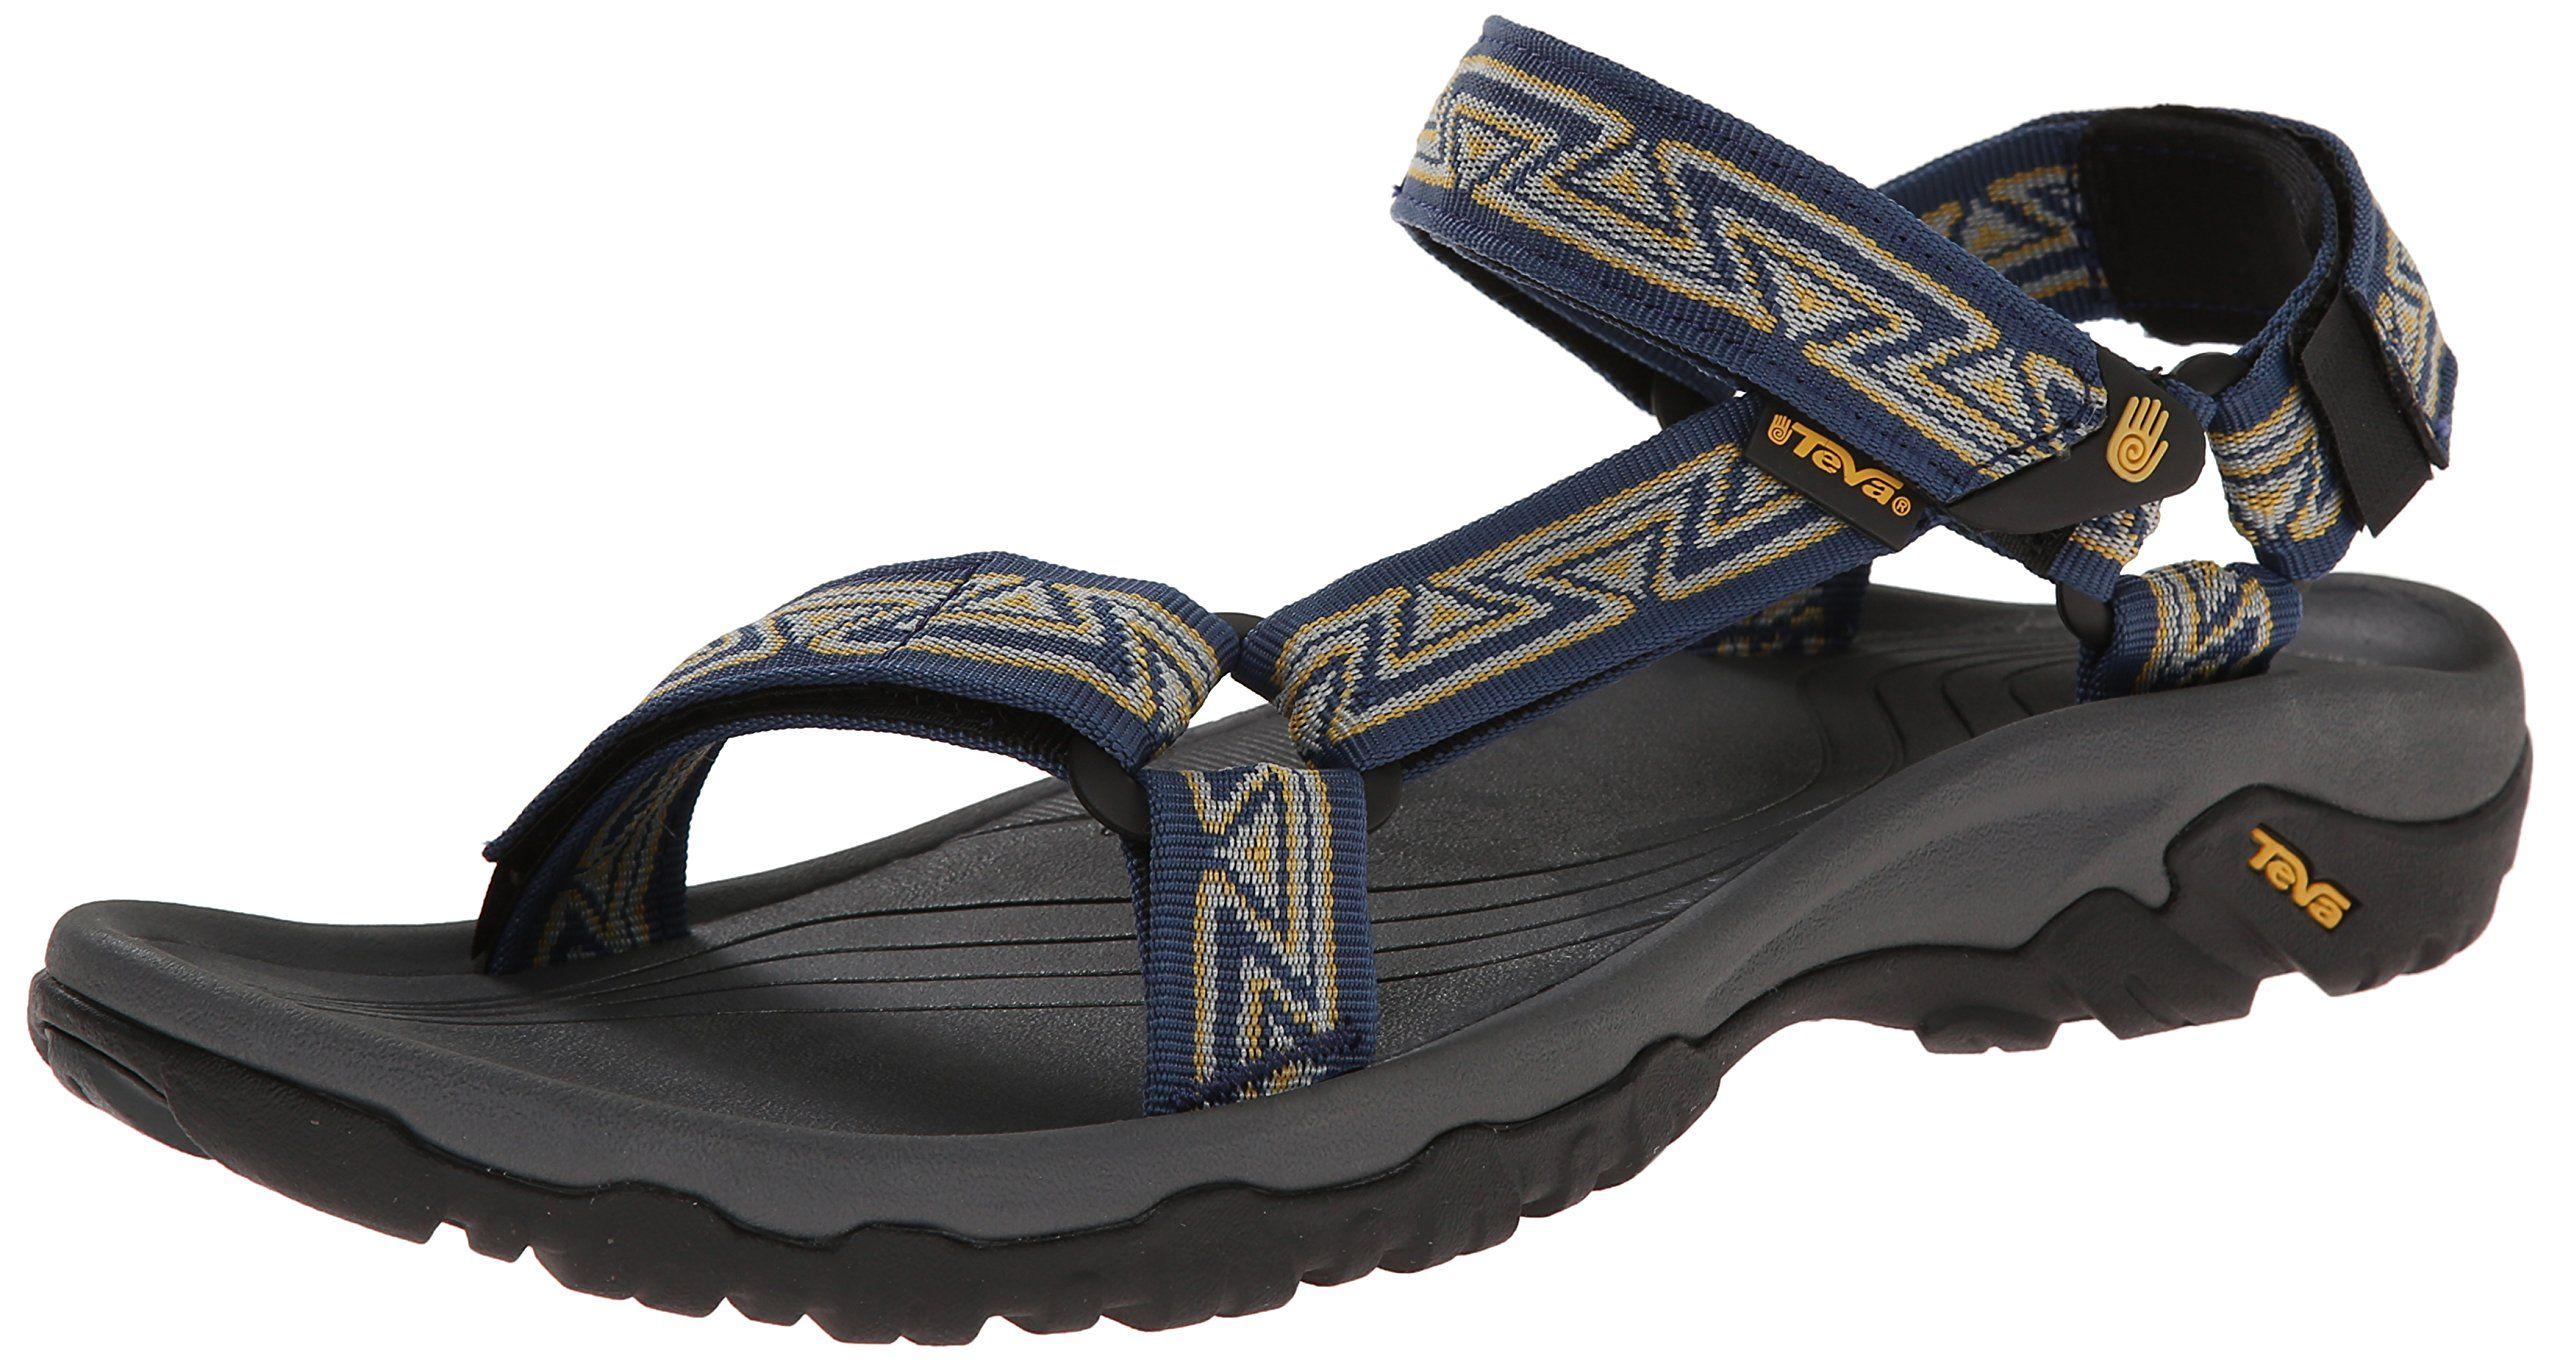 c16ca2521909 Teva Men s Hurricane XLT Sandal Pretty Sandals